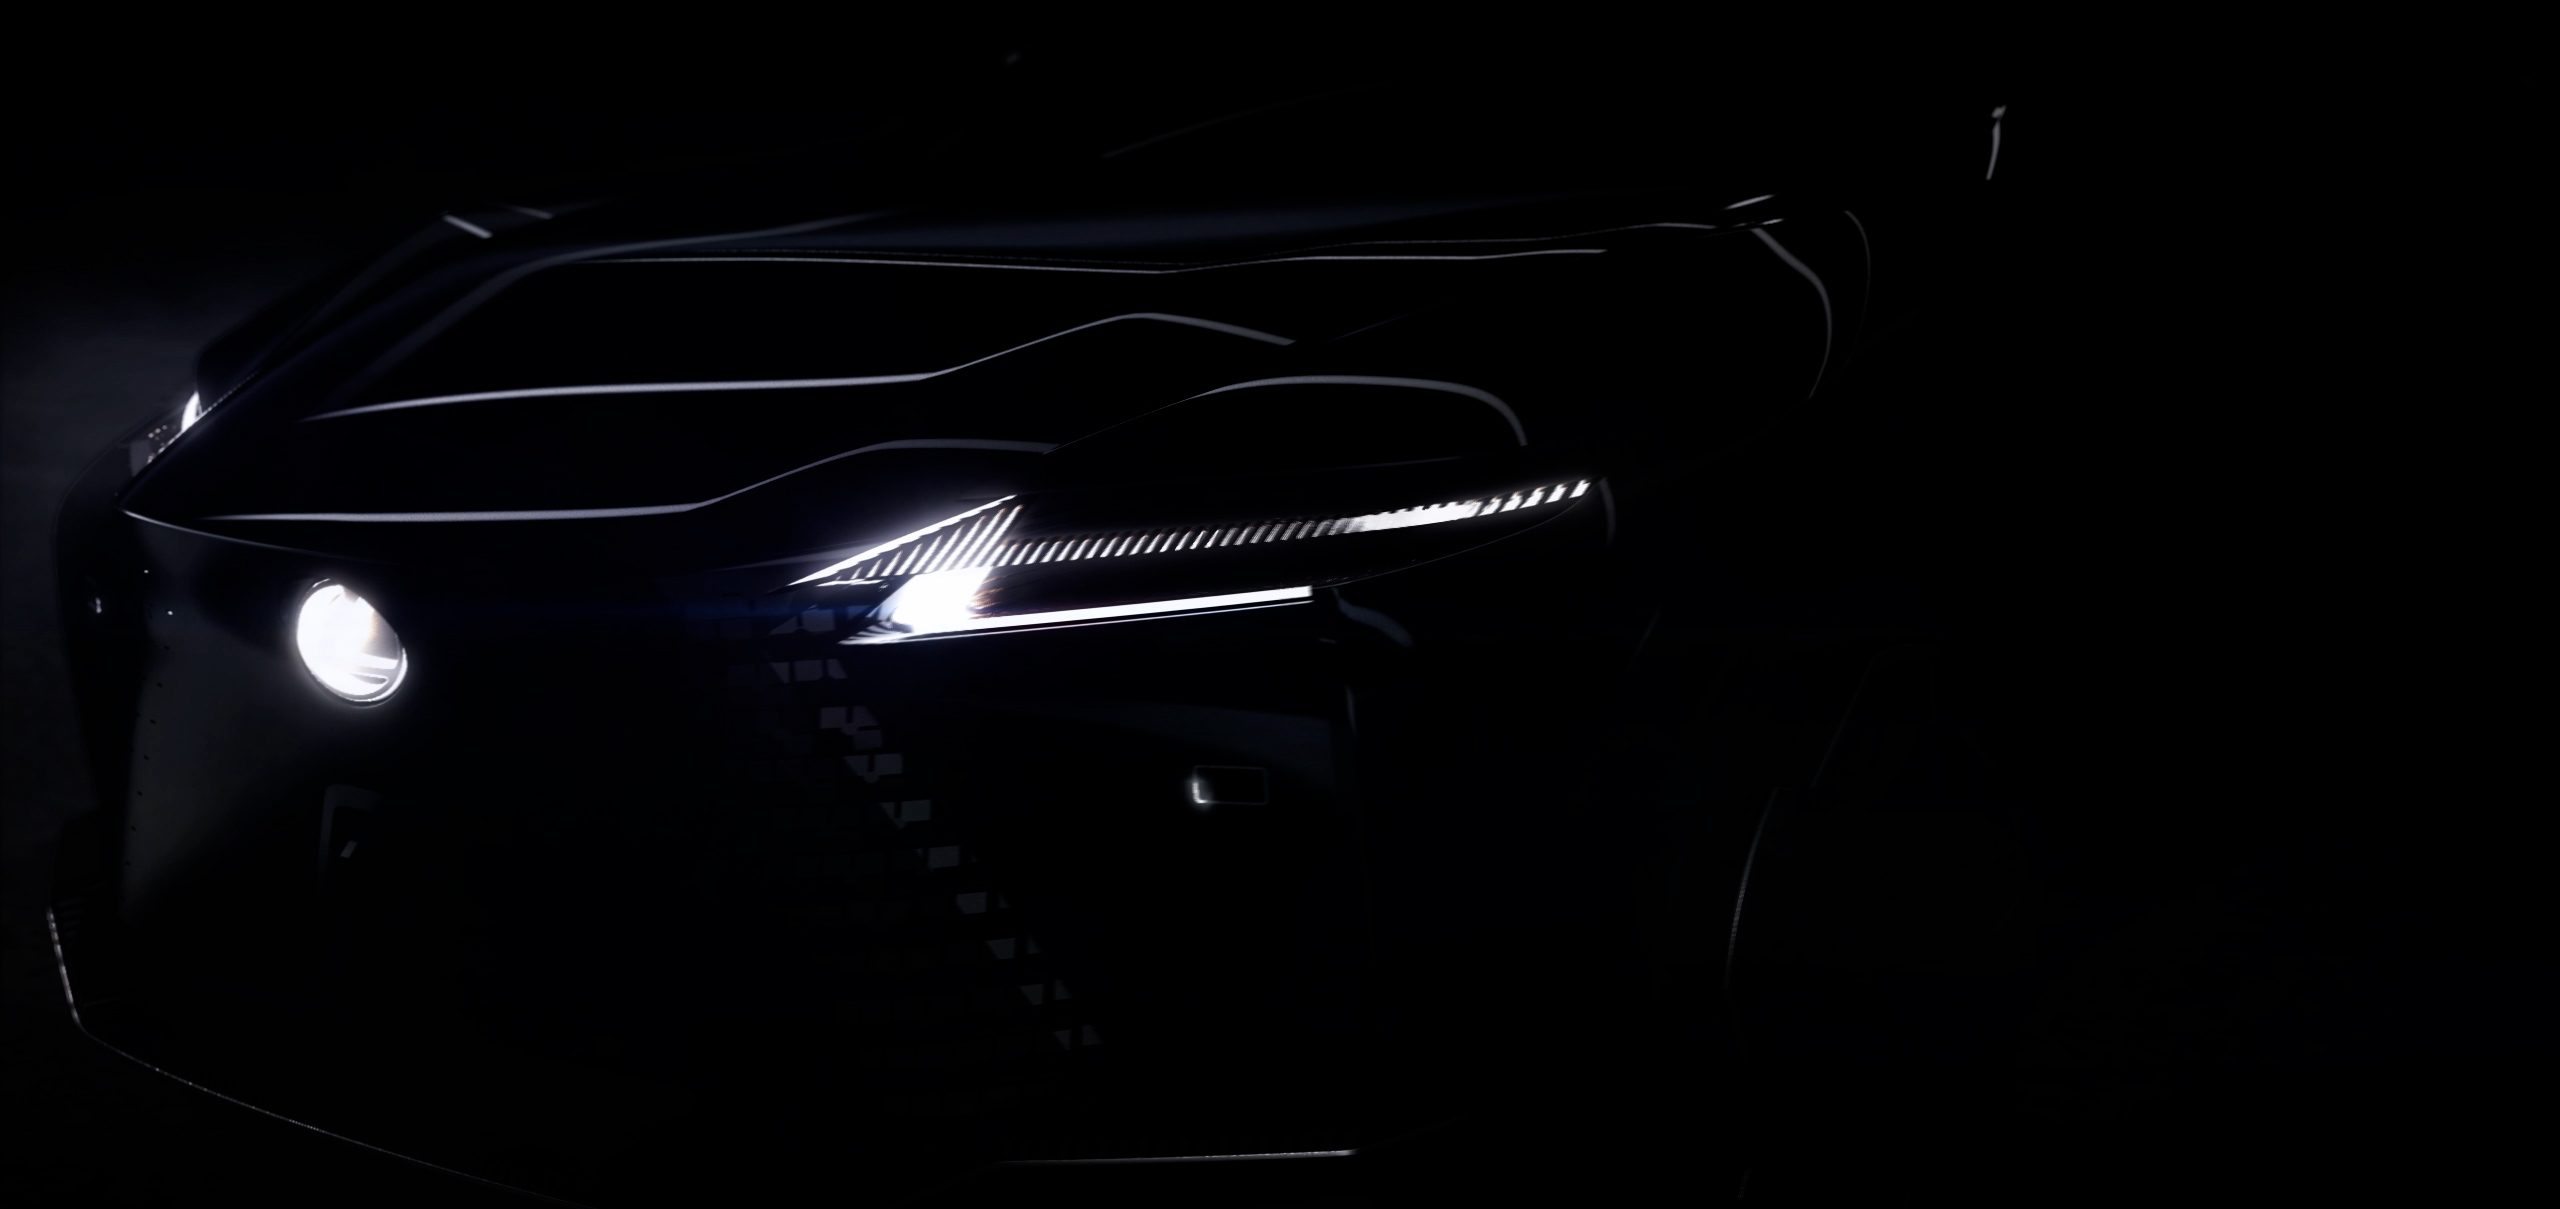 Lexus Teases Electric Suv Powered By New Drivetrain Technology Electrek